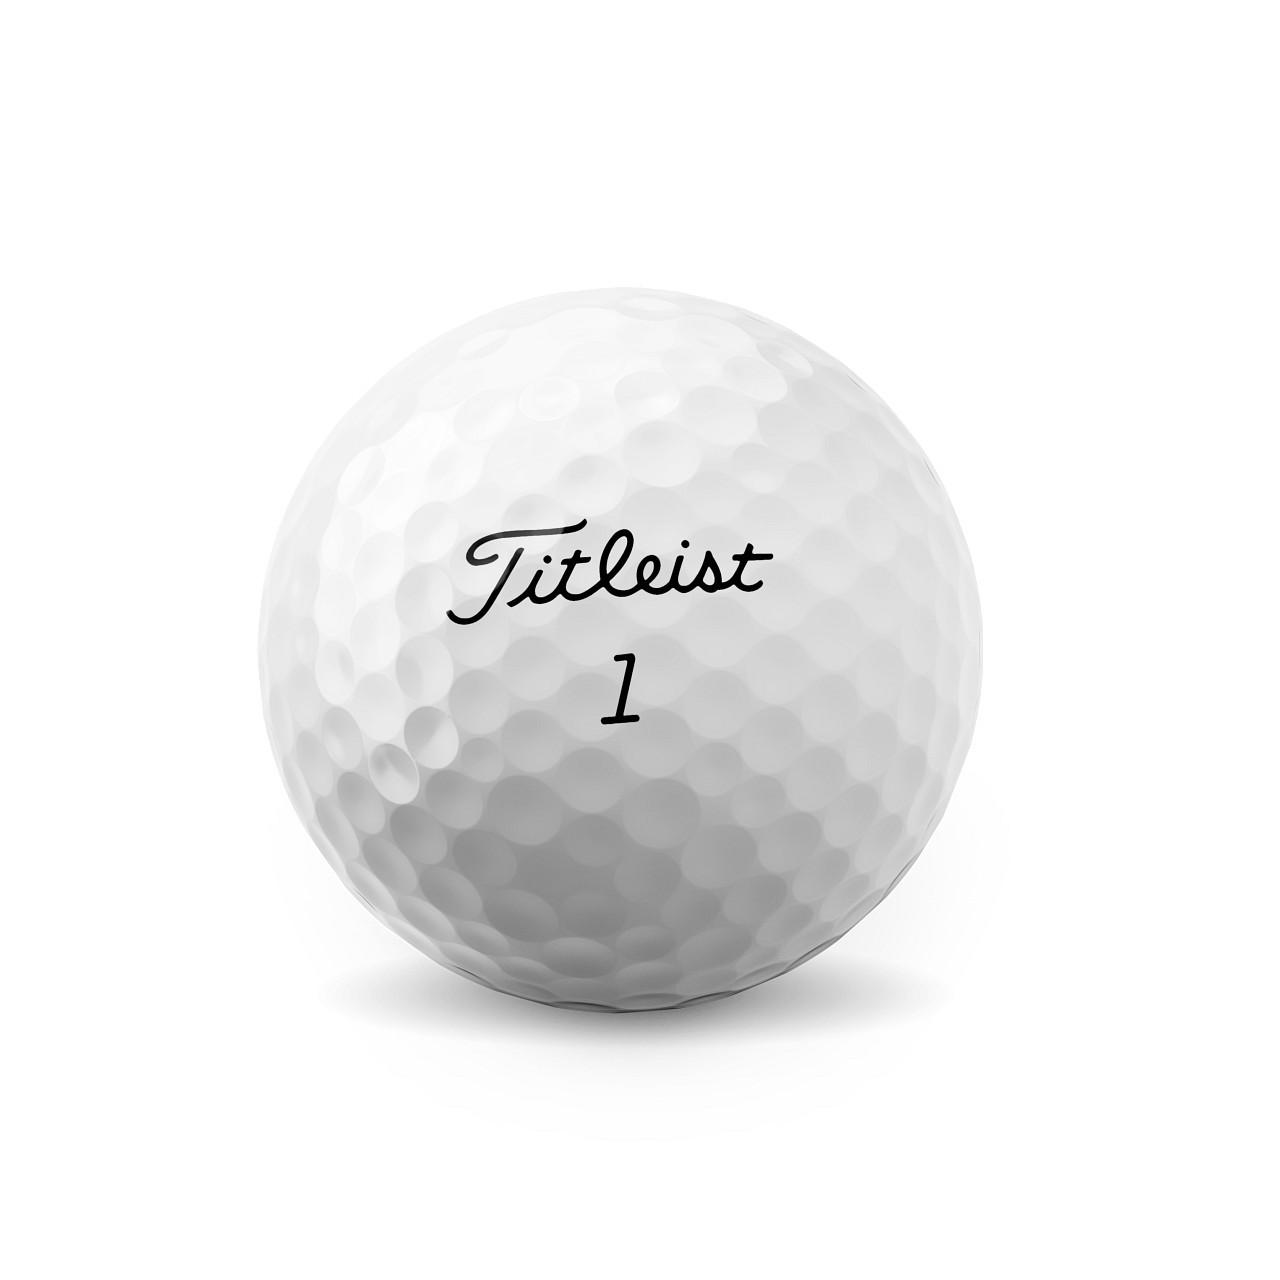 Titleist Pro V1 Dozen Golf Balls 2021 - Low Numbers (#1 - #4)